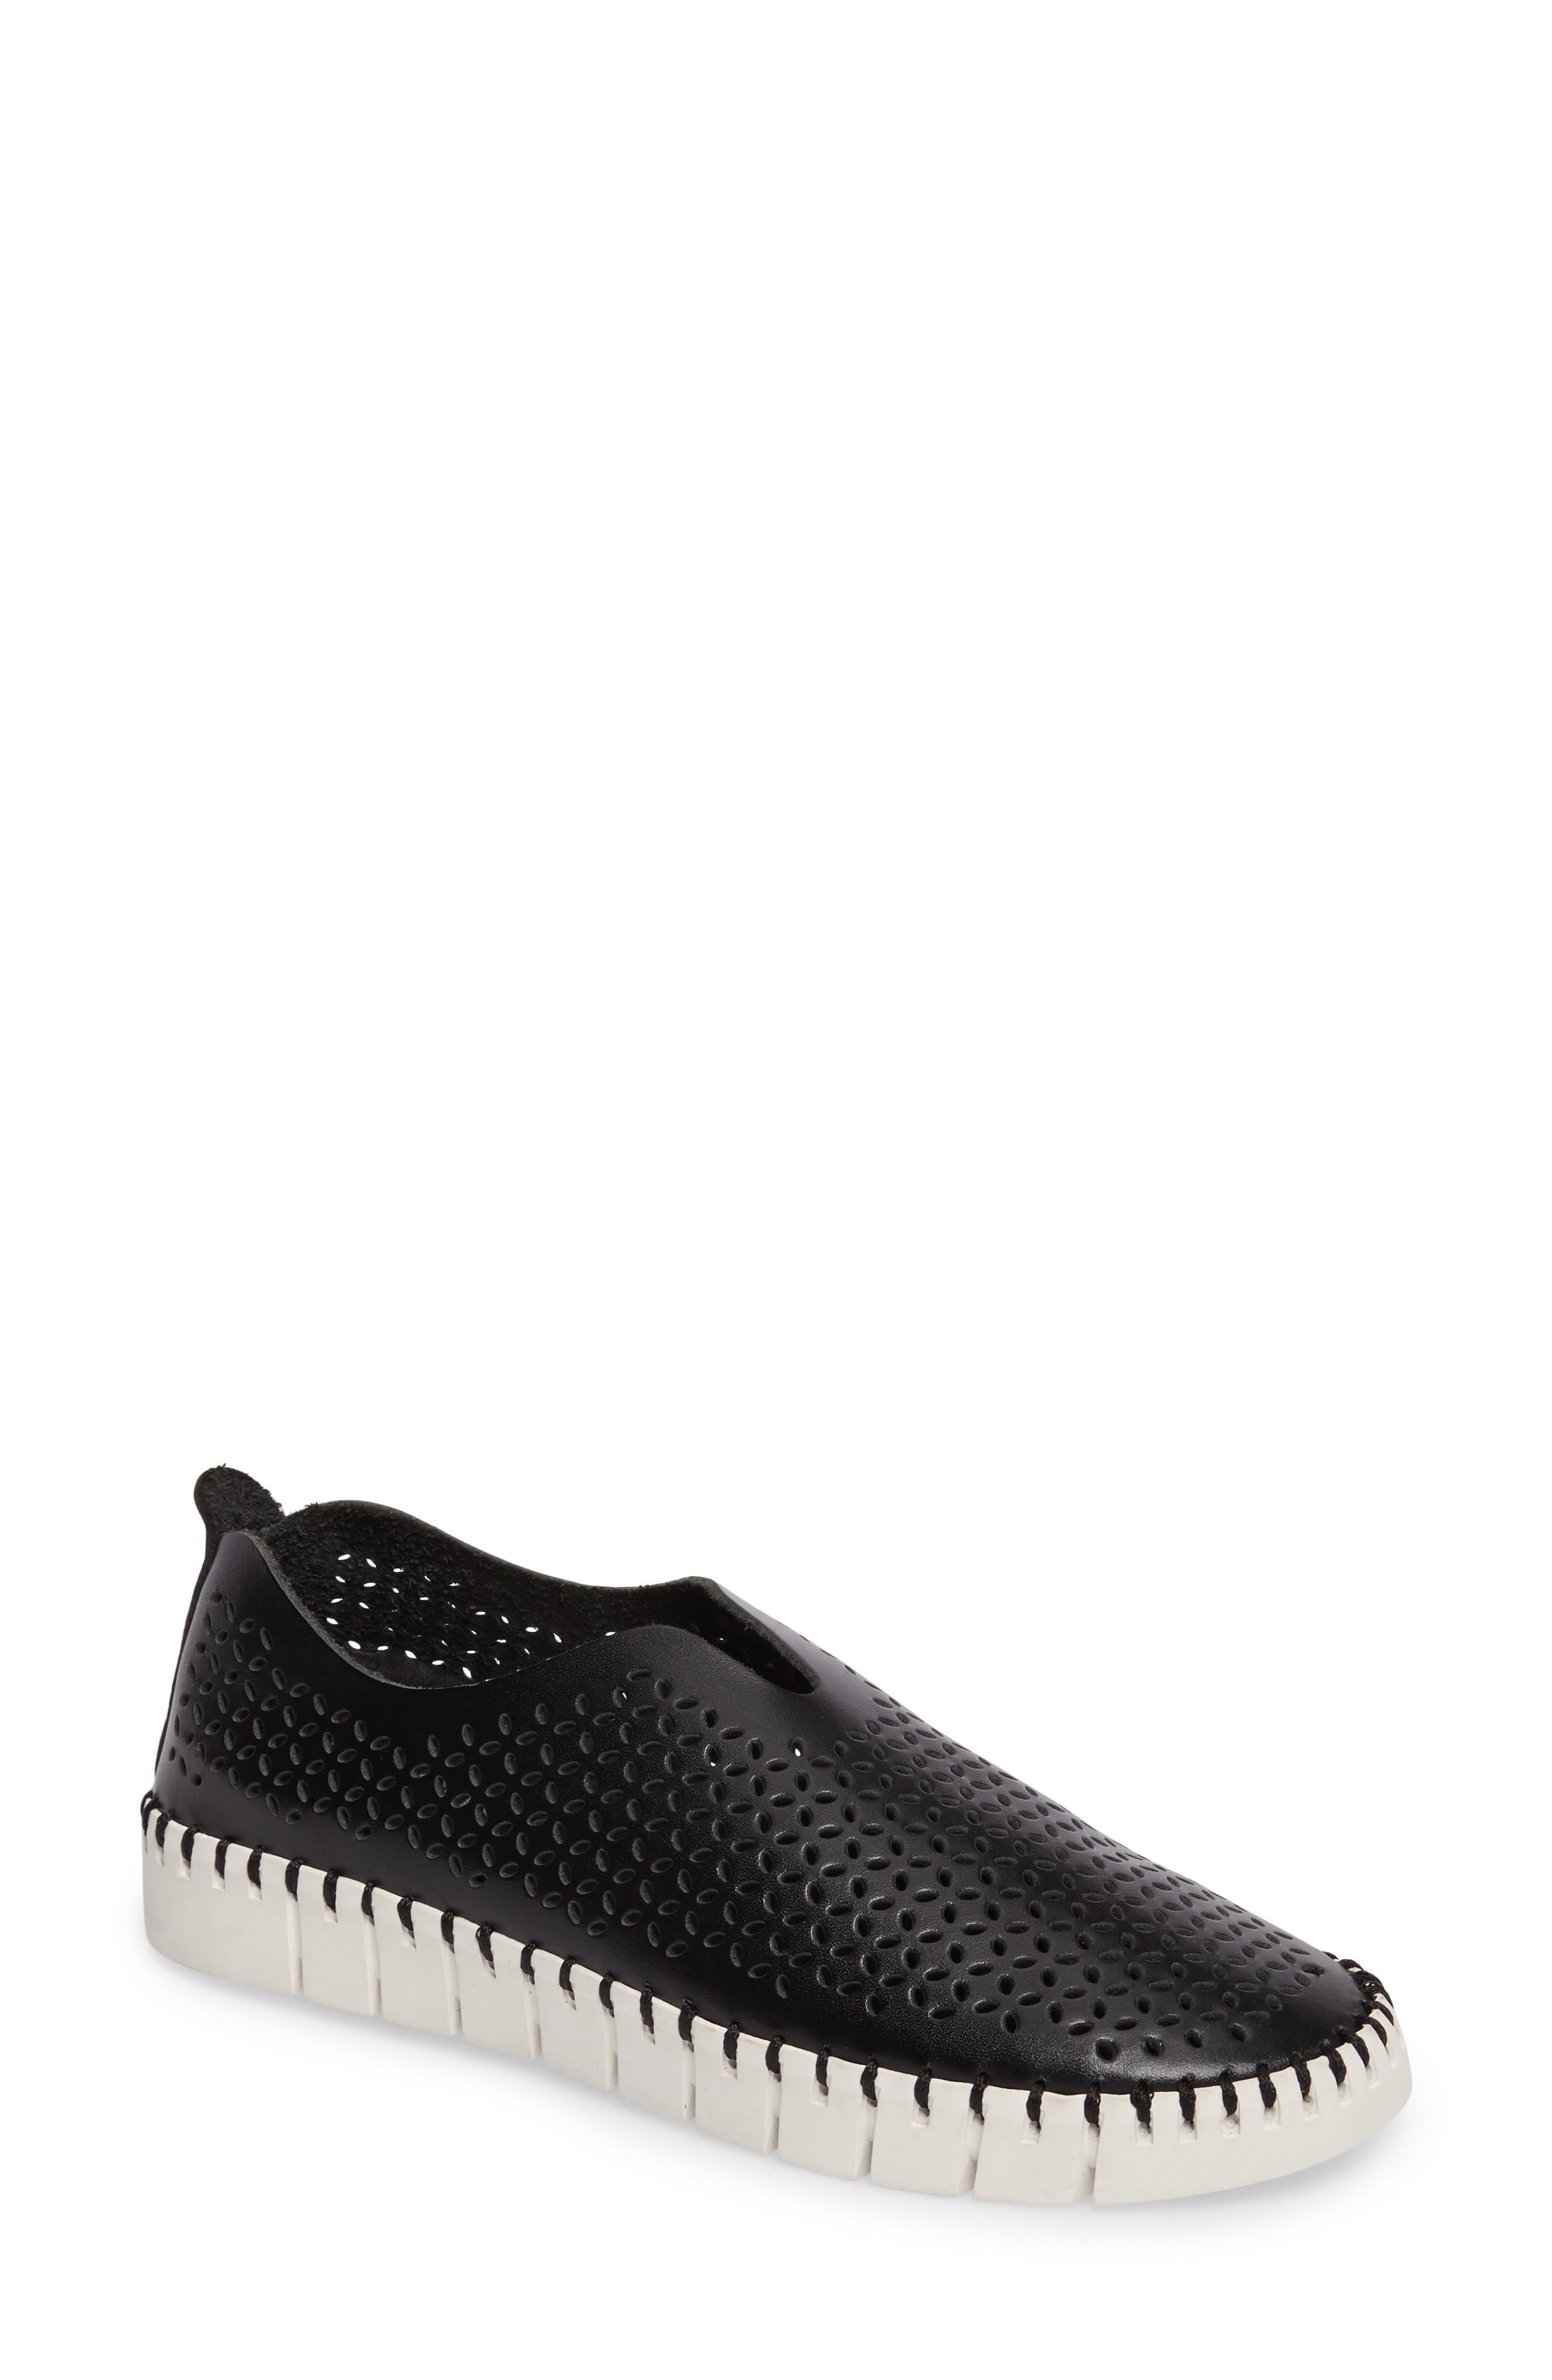 Jeffrey Campbell Tiles Perforated Slip-On Sneaker (Women)